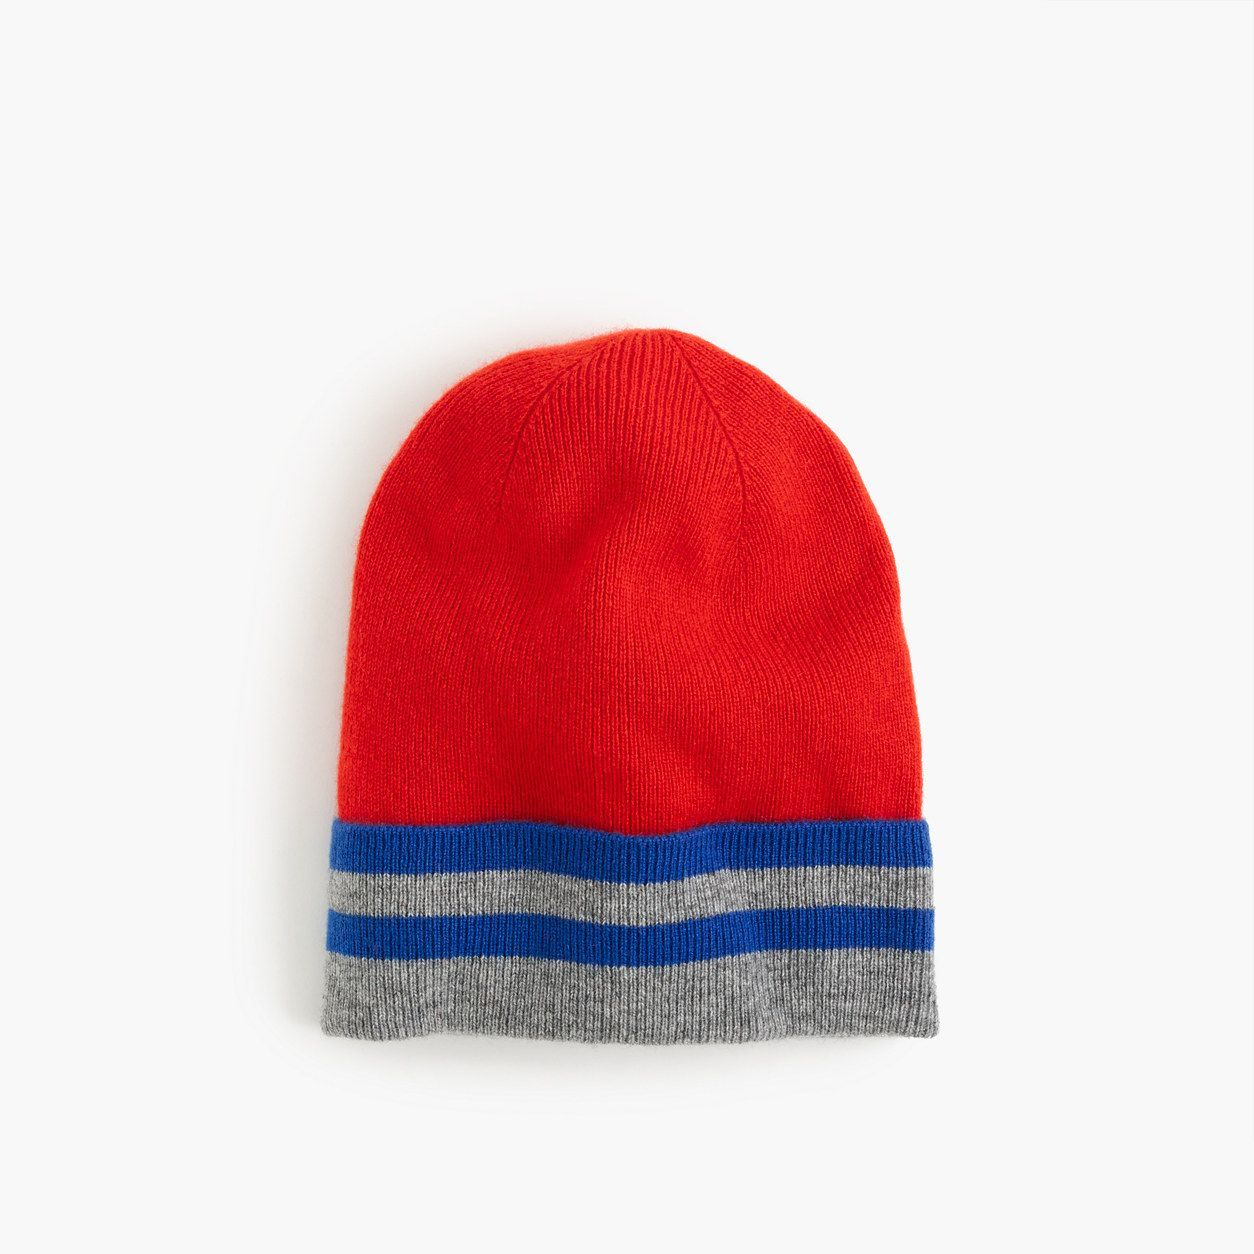 crewcuts Boys Striped Cashmere Beanie Hat (Size L-XL Kid)